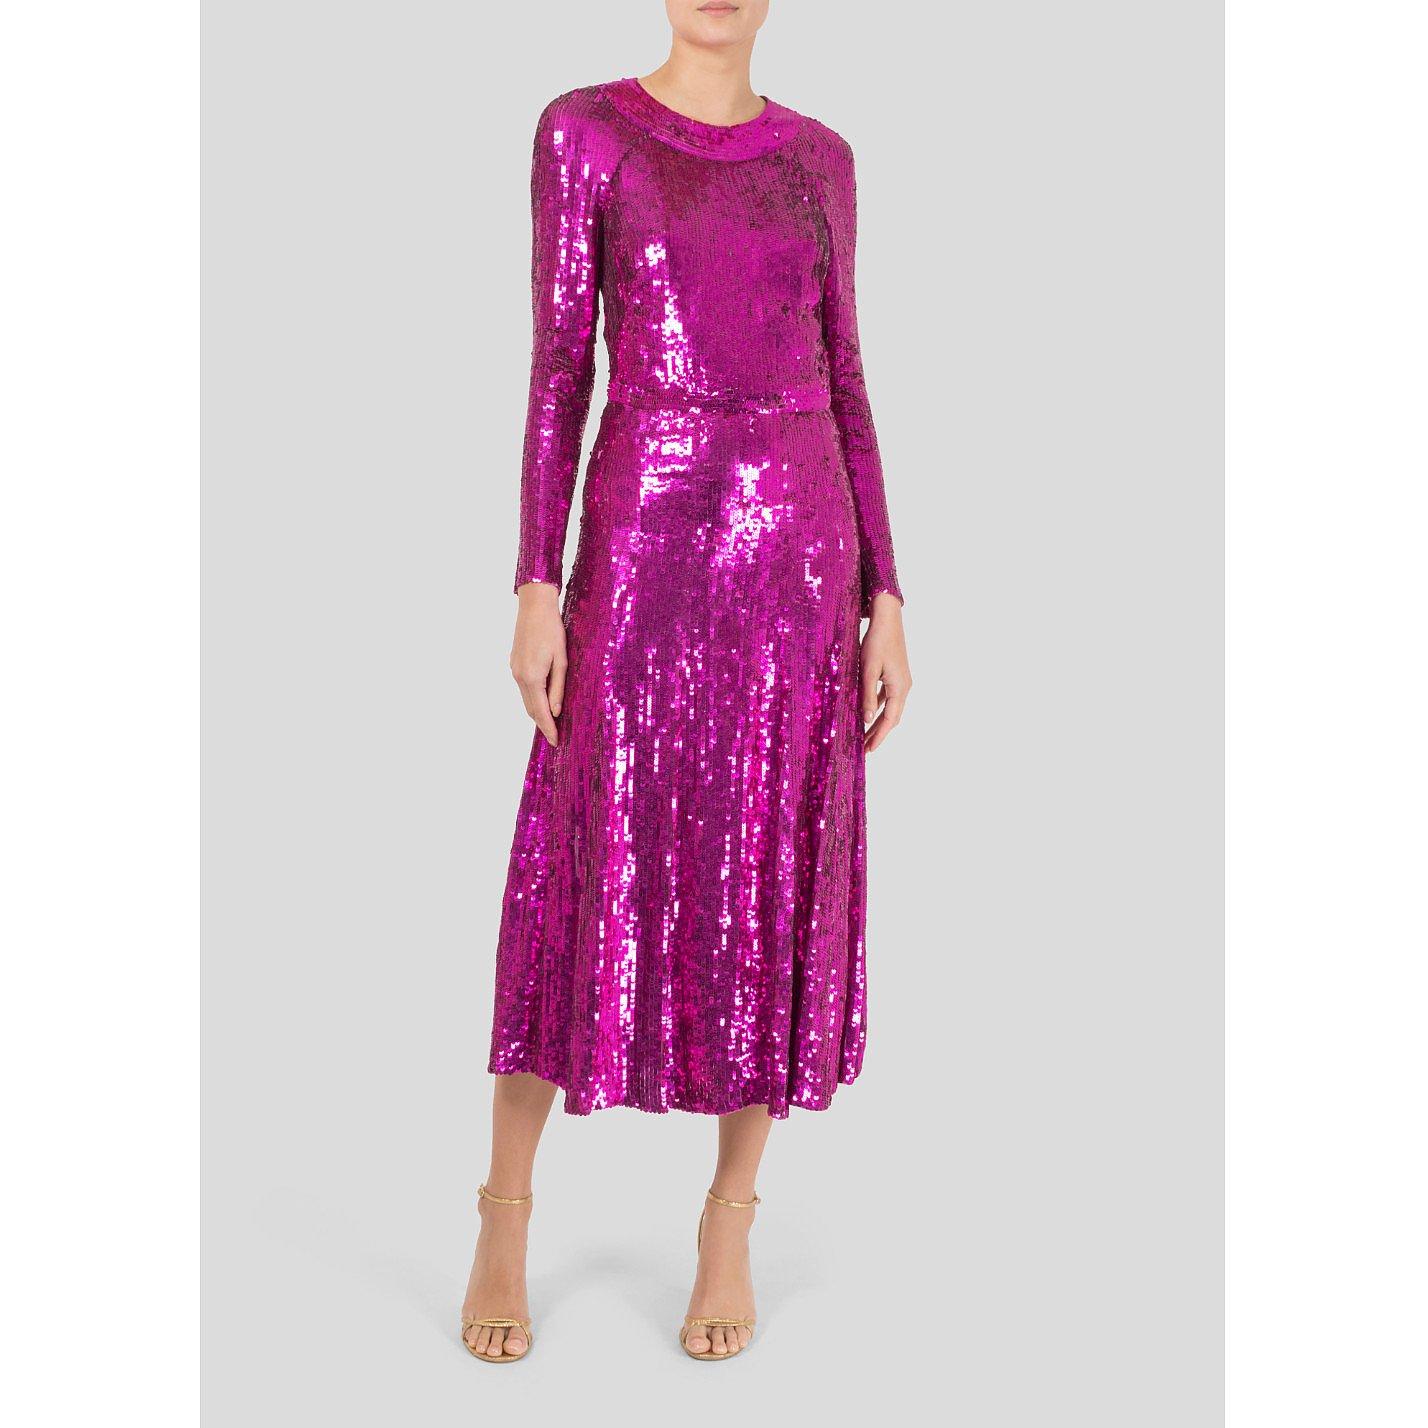 Temperley London Ray Sequin Dress